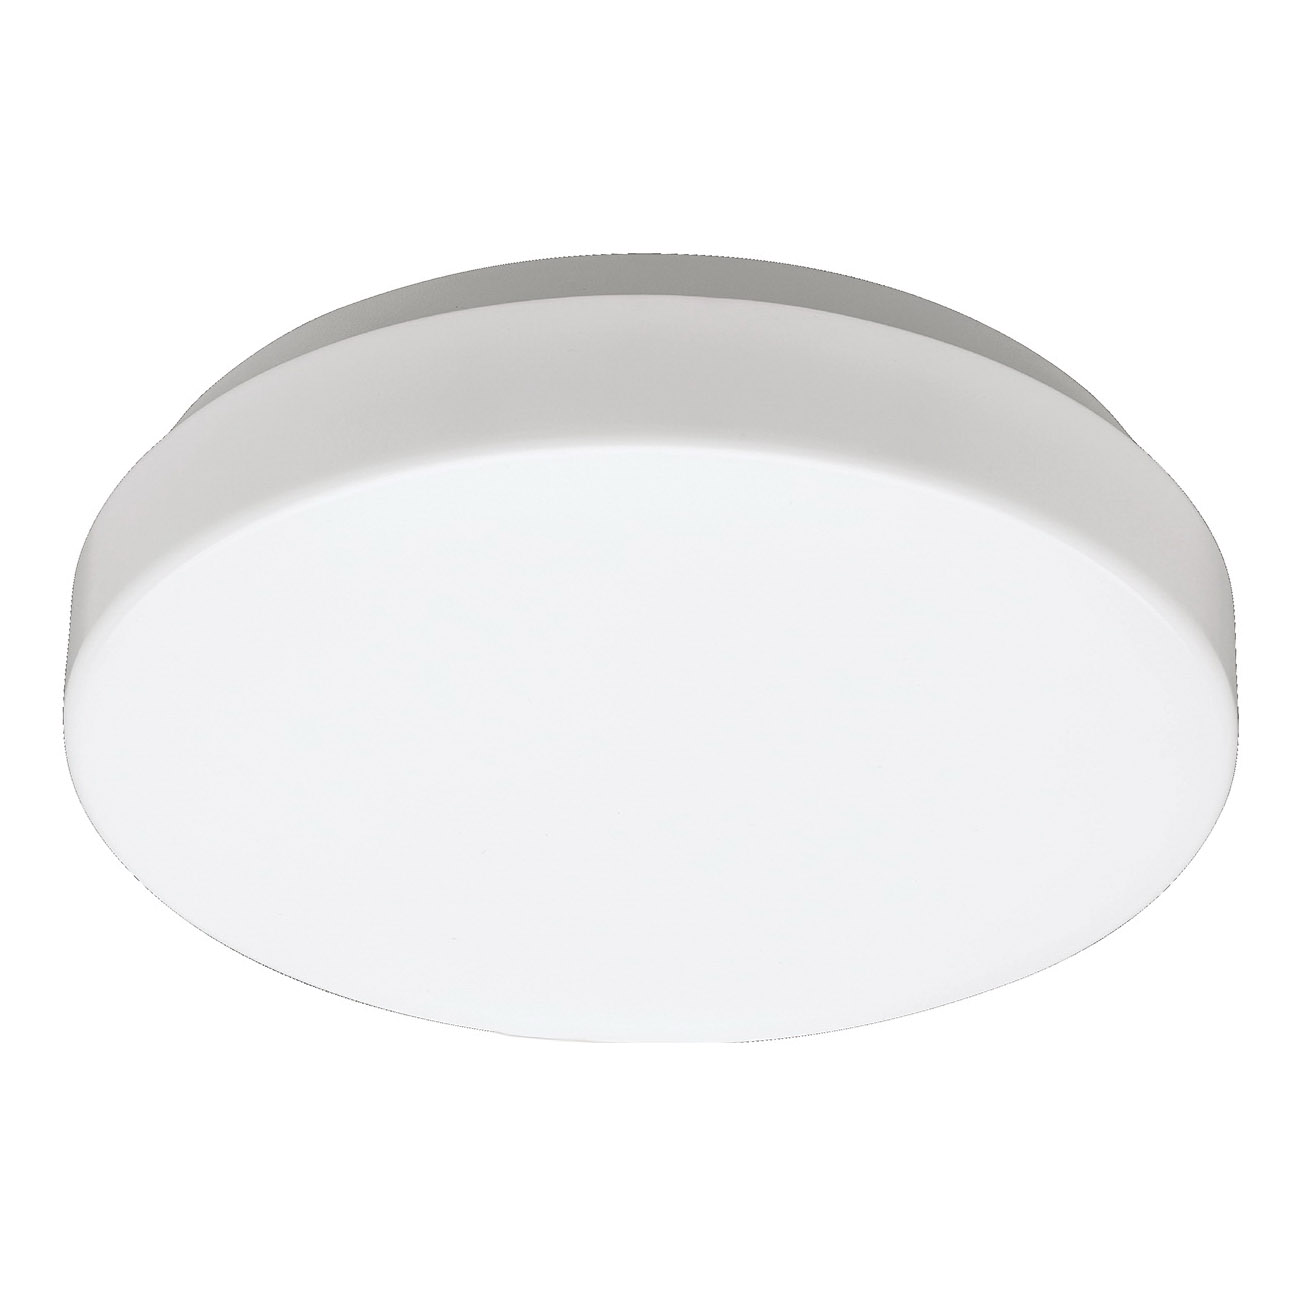 Picture of ETI 54663142 Low-Profile Light Fixture, 120 V, 11.5 W, LED Lamp, 810 Lumens, 4000 K Color Temp